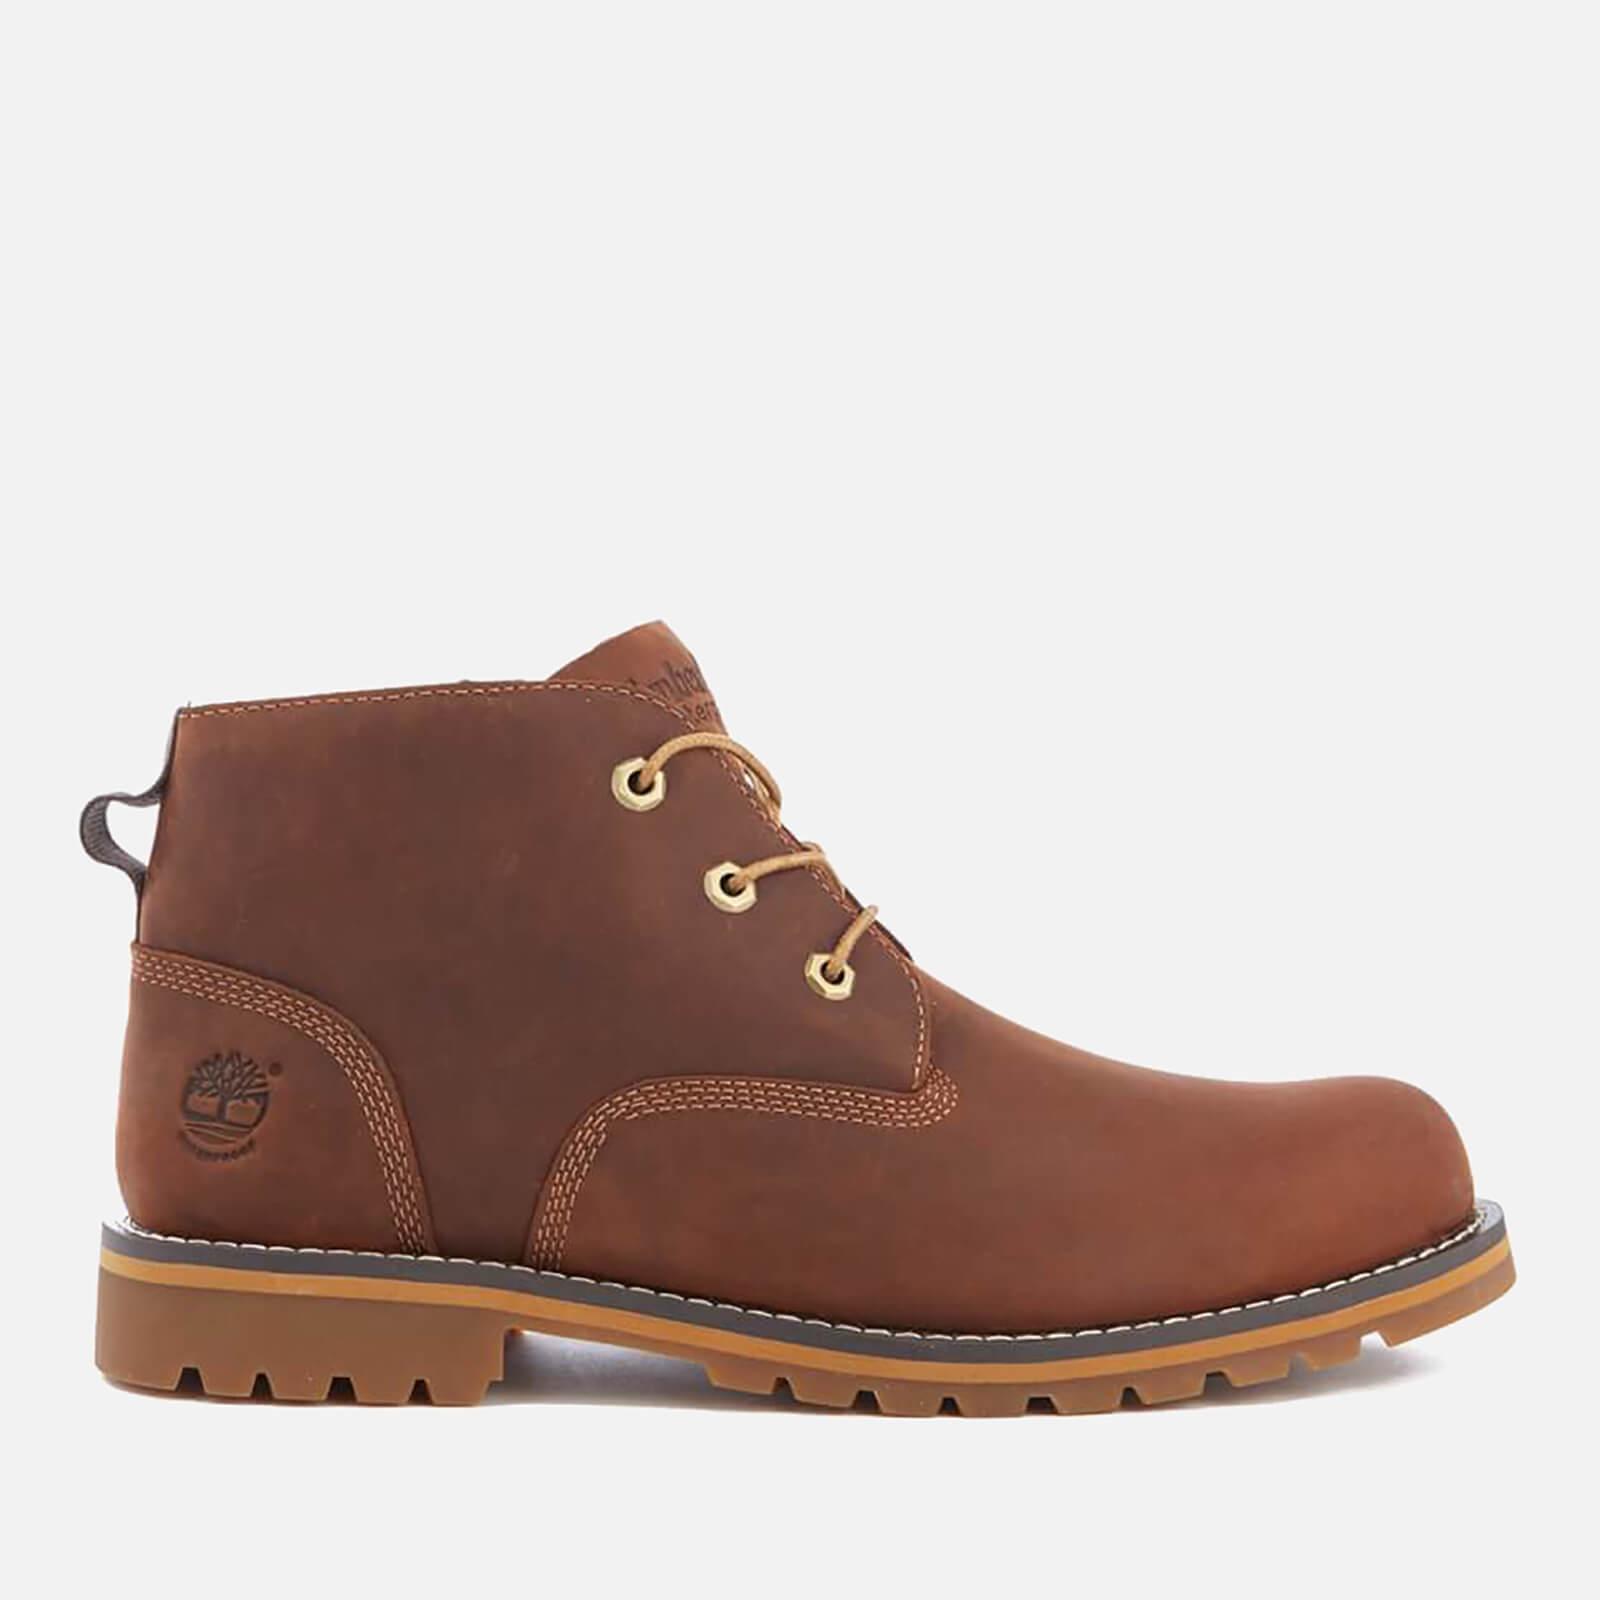 328b642f69f Timberland Men's Larchmont WP Chukka Boots - Glazed Ginger